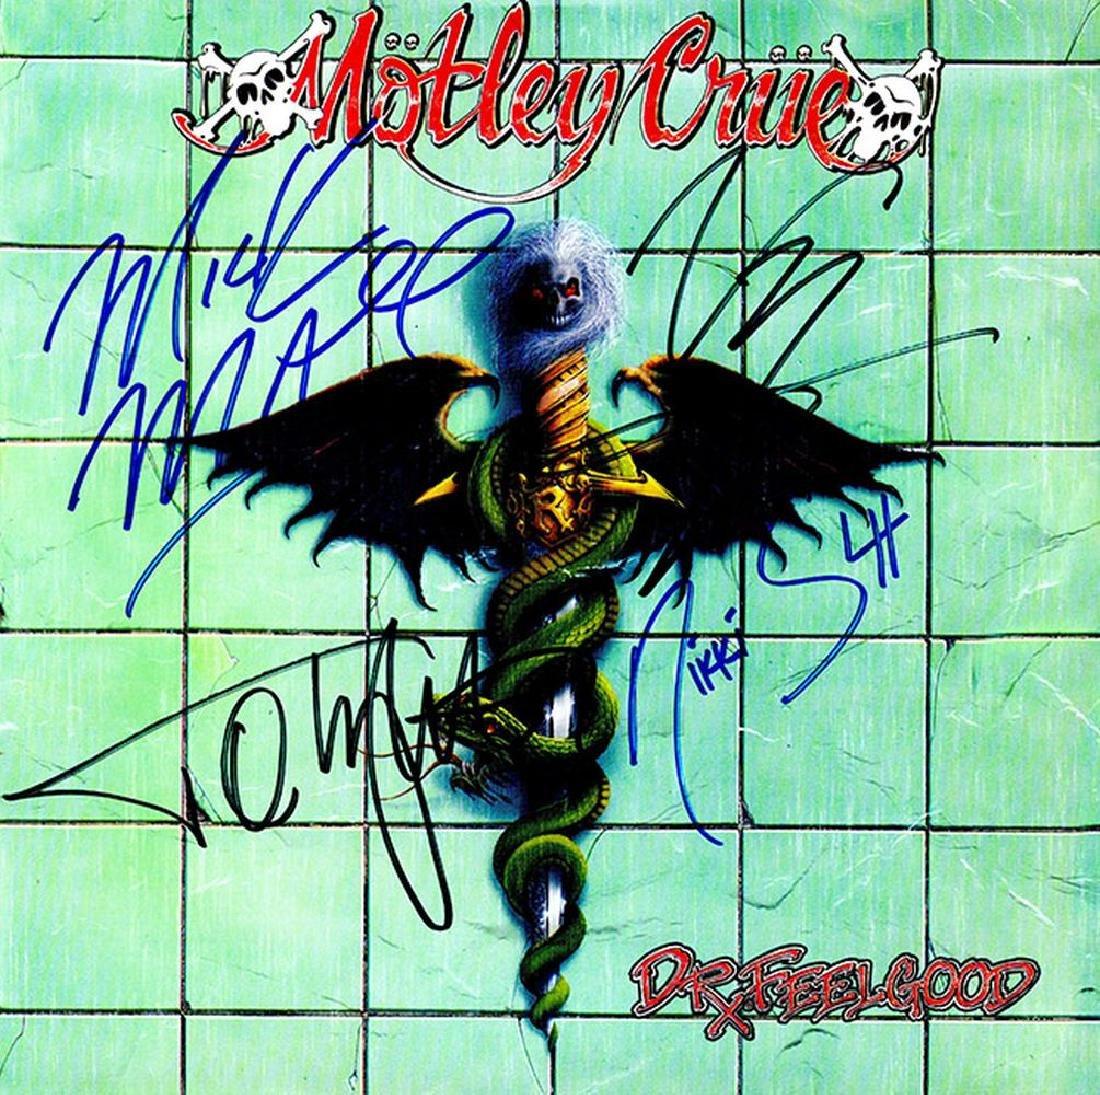 Motley Crue Band Signed Dr. Feelgood Album